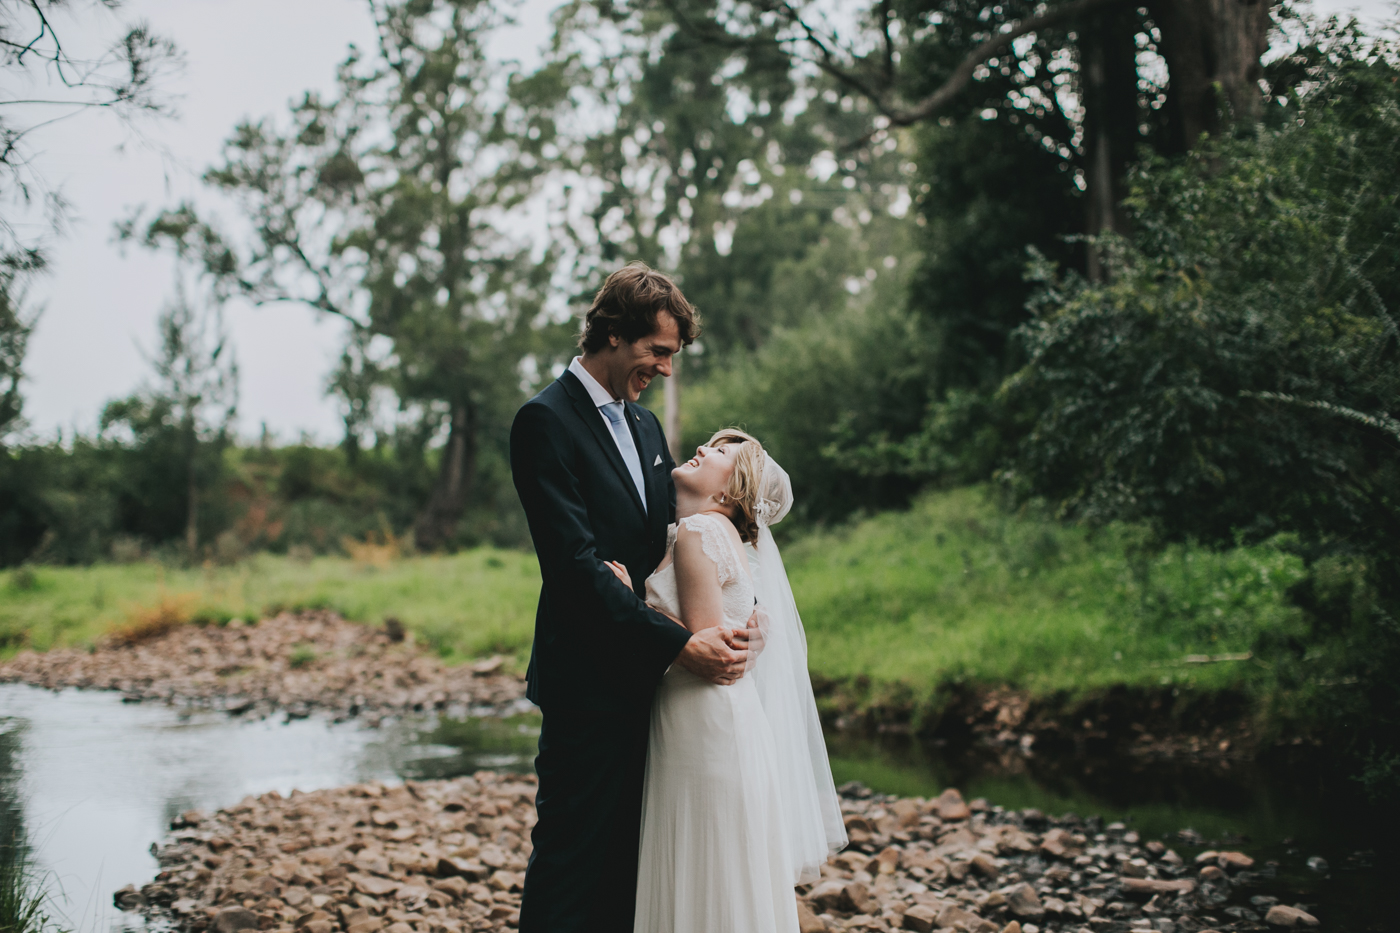 Rachel & Jacob - Willow Farm Berry - South Coast Wedding - Samantha Heather Photography-153.jpg